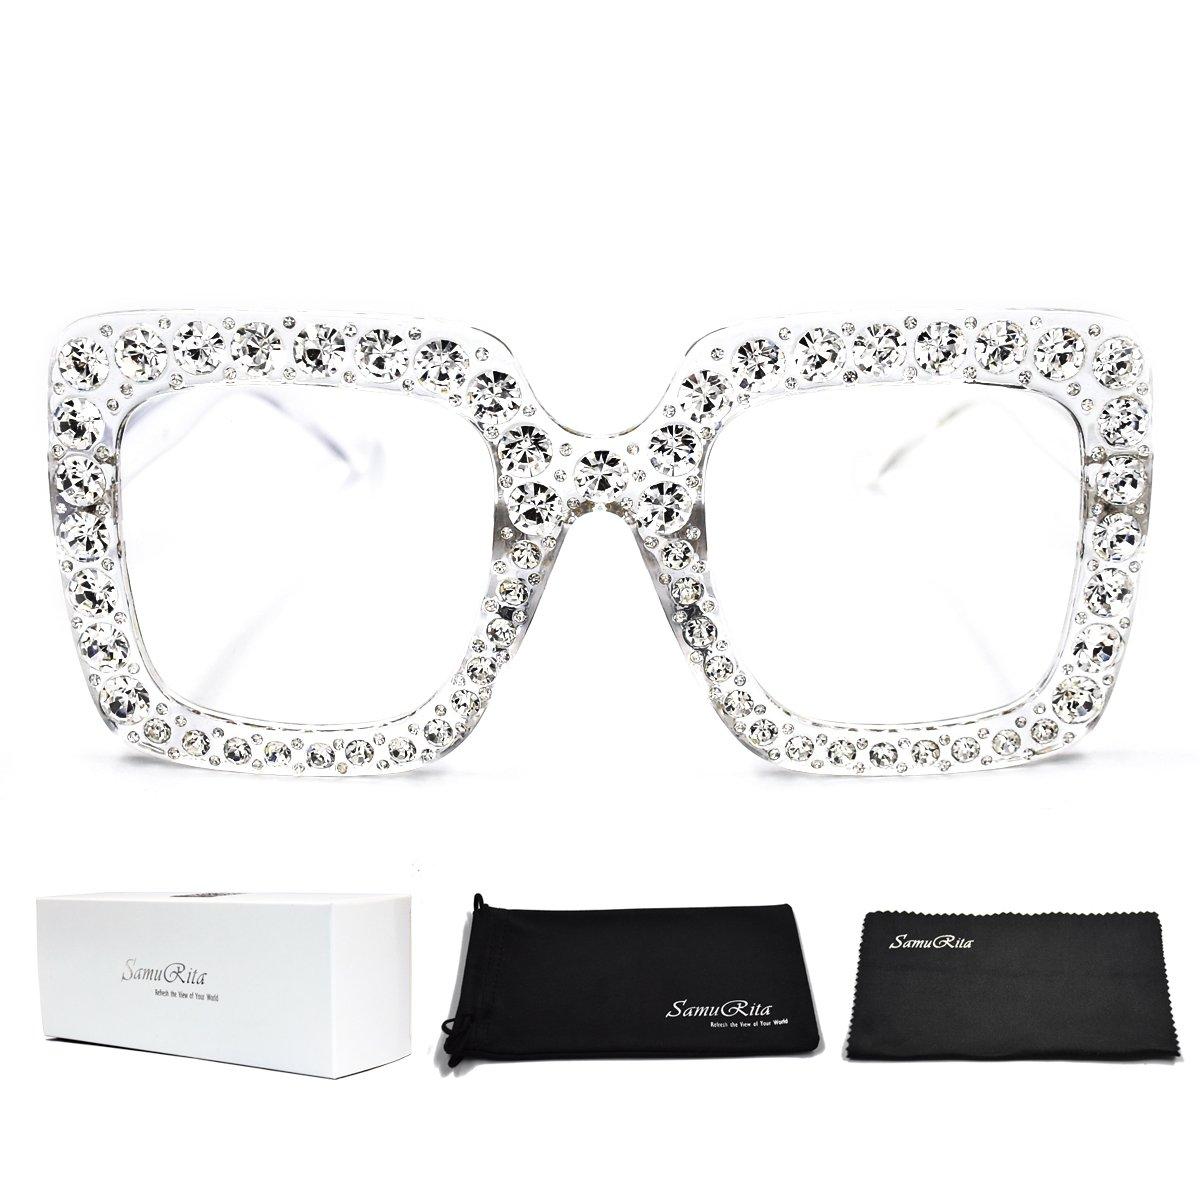 SamuRita Elton Square Diamond Rhinestone Sunglasses Novelty Oversized Celebrity Shades(Clear Frame/Clear Lens) by SamuRita